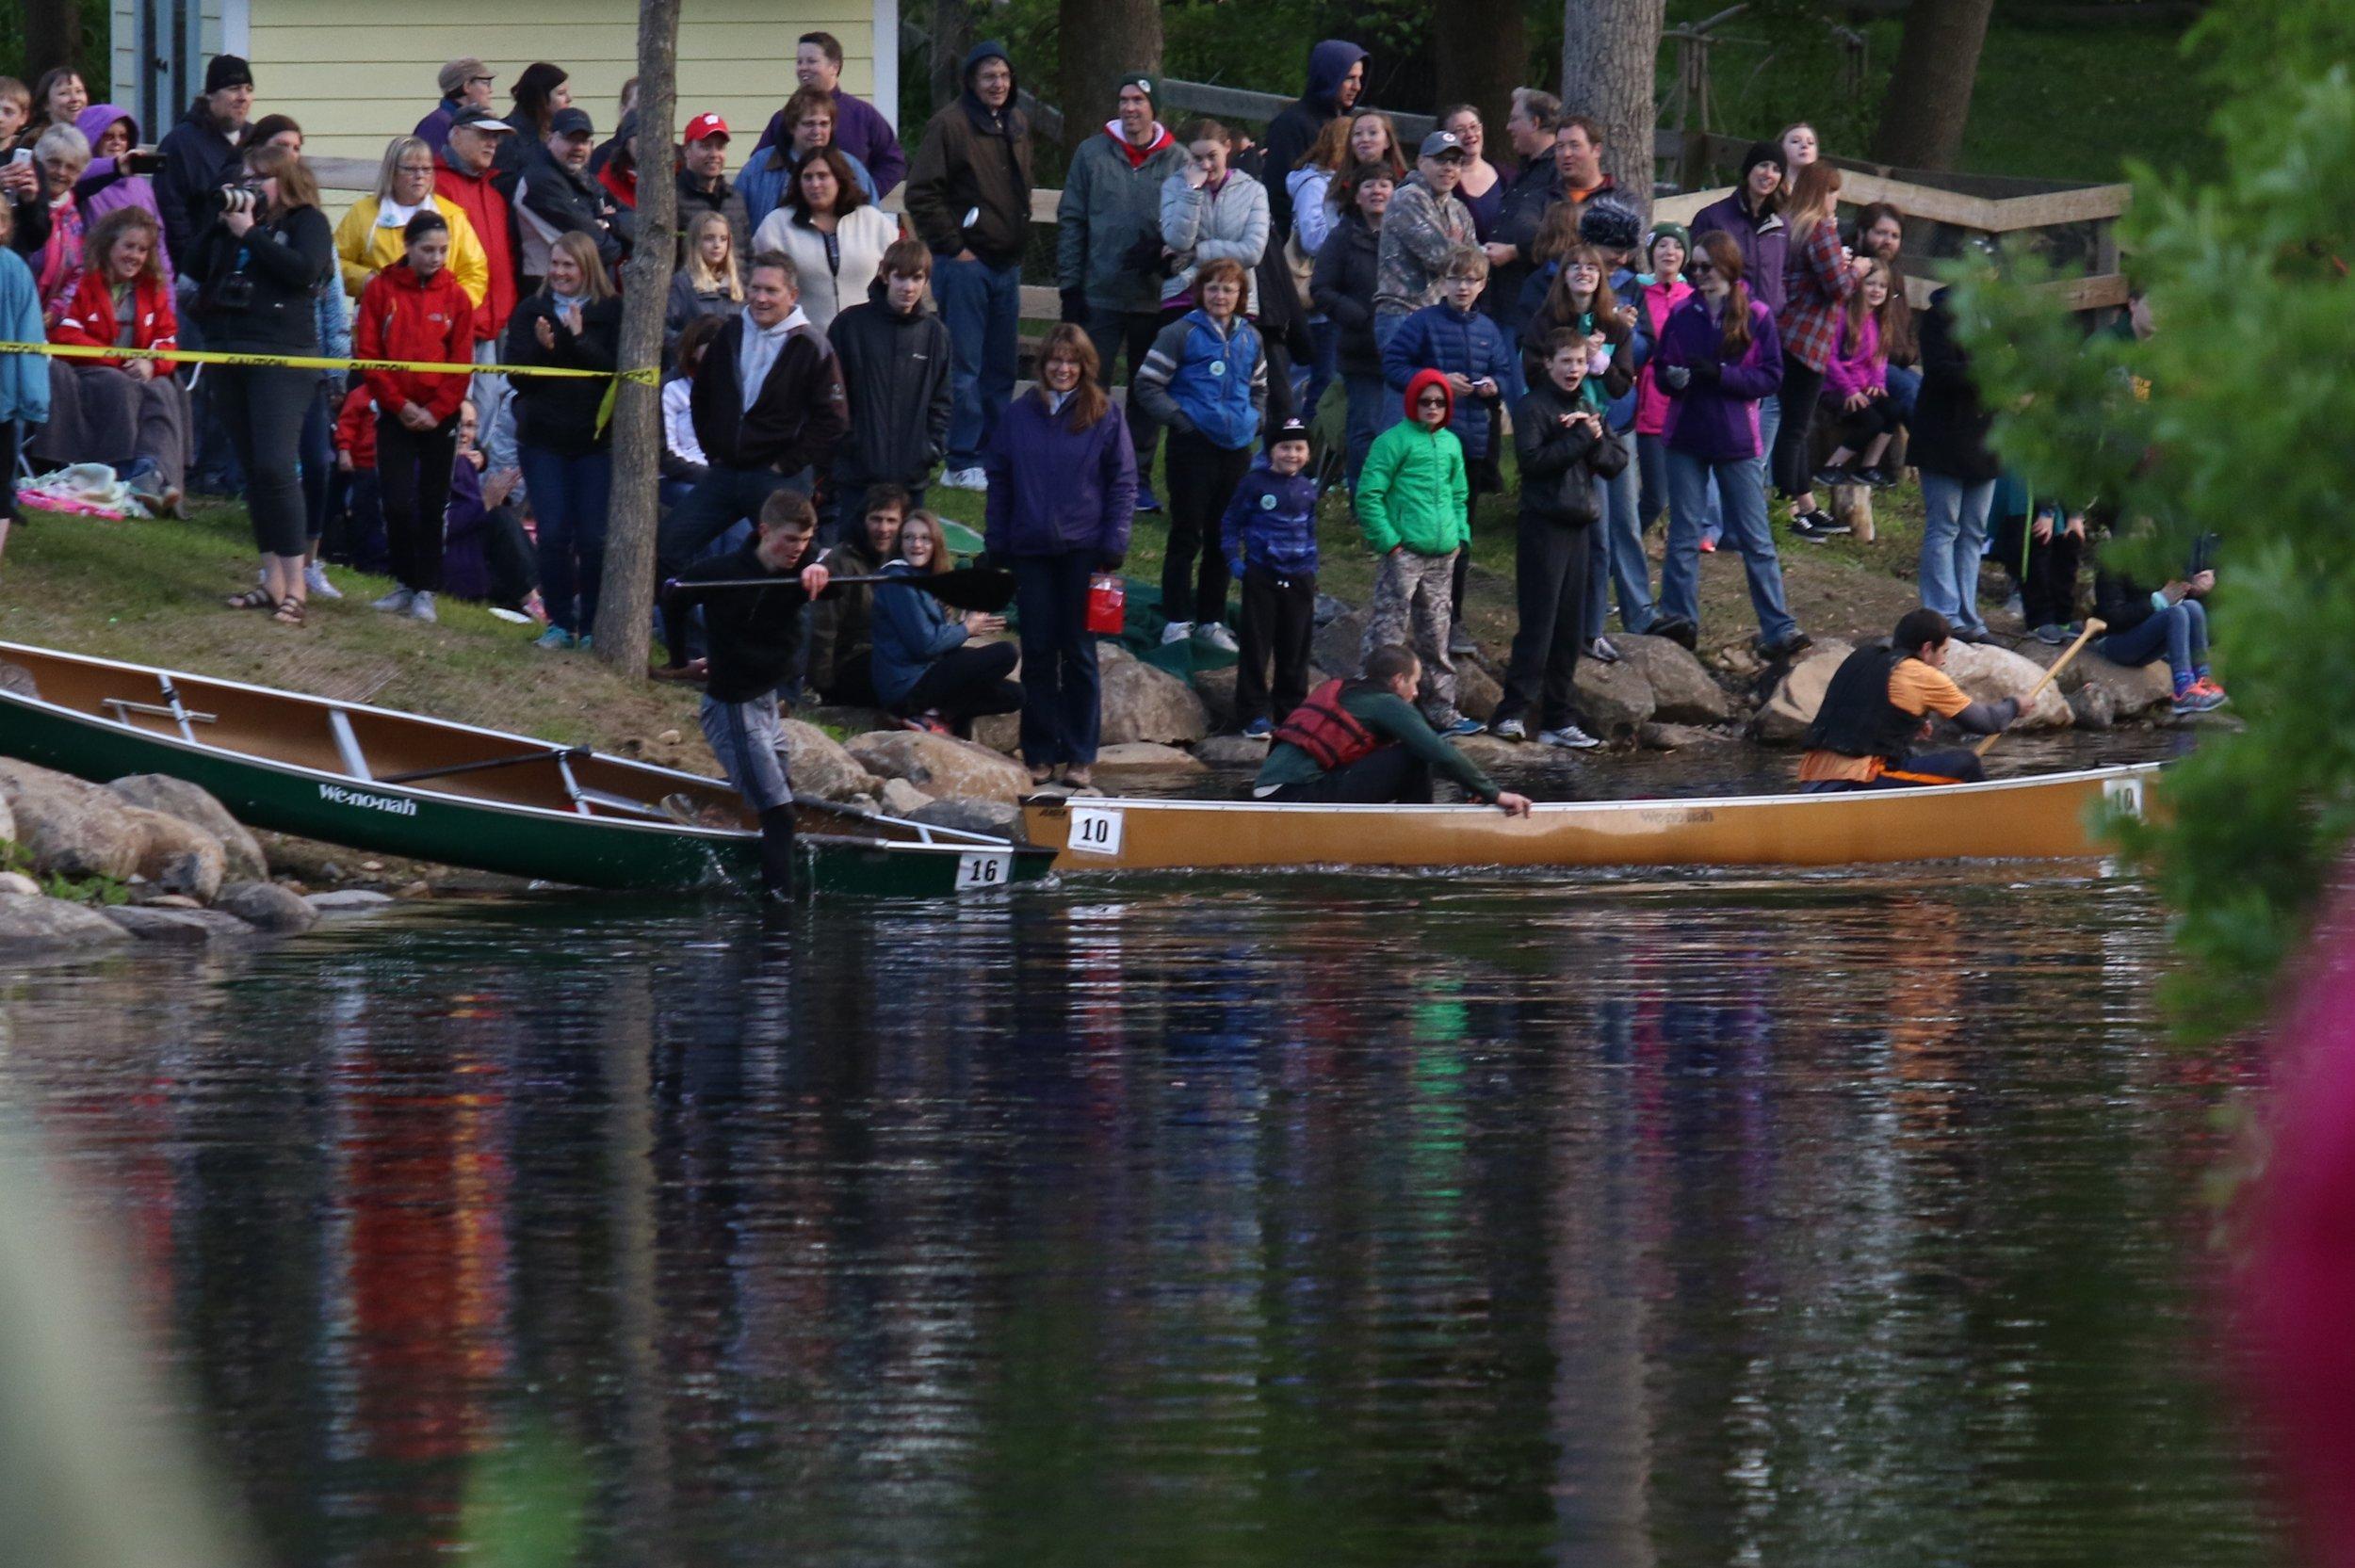 CanoeRaceCrowds 376A1664.JPG